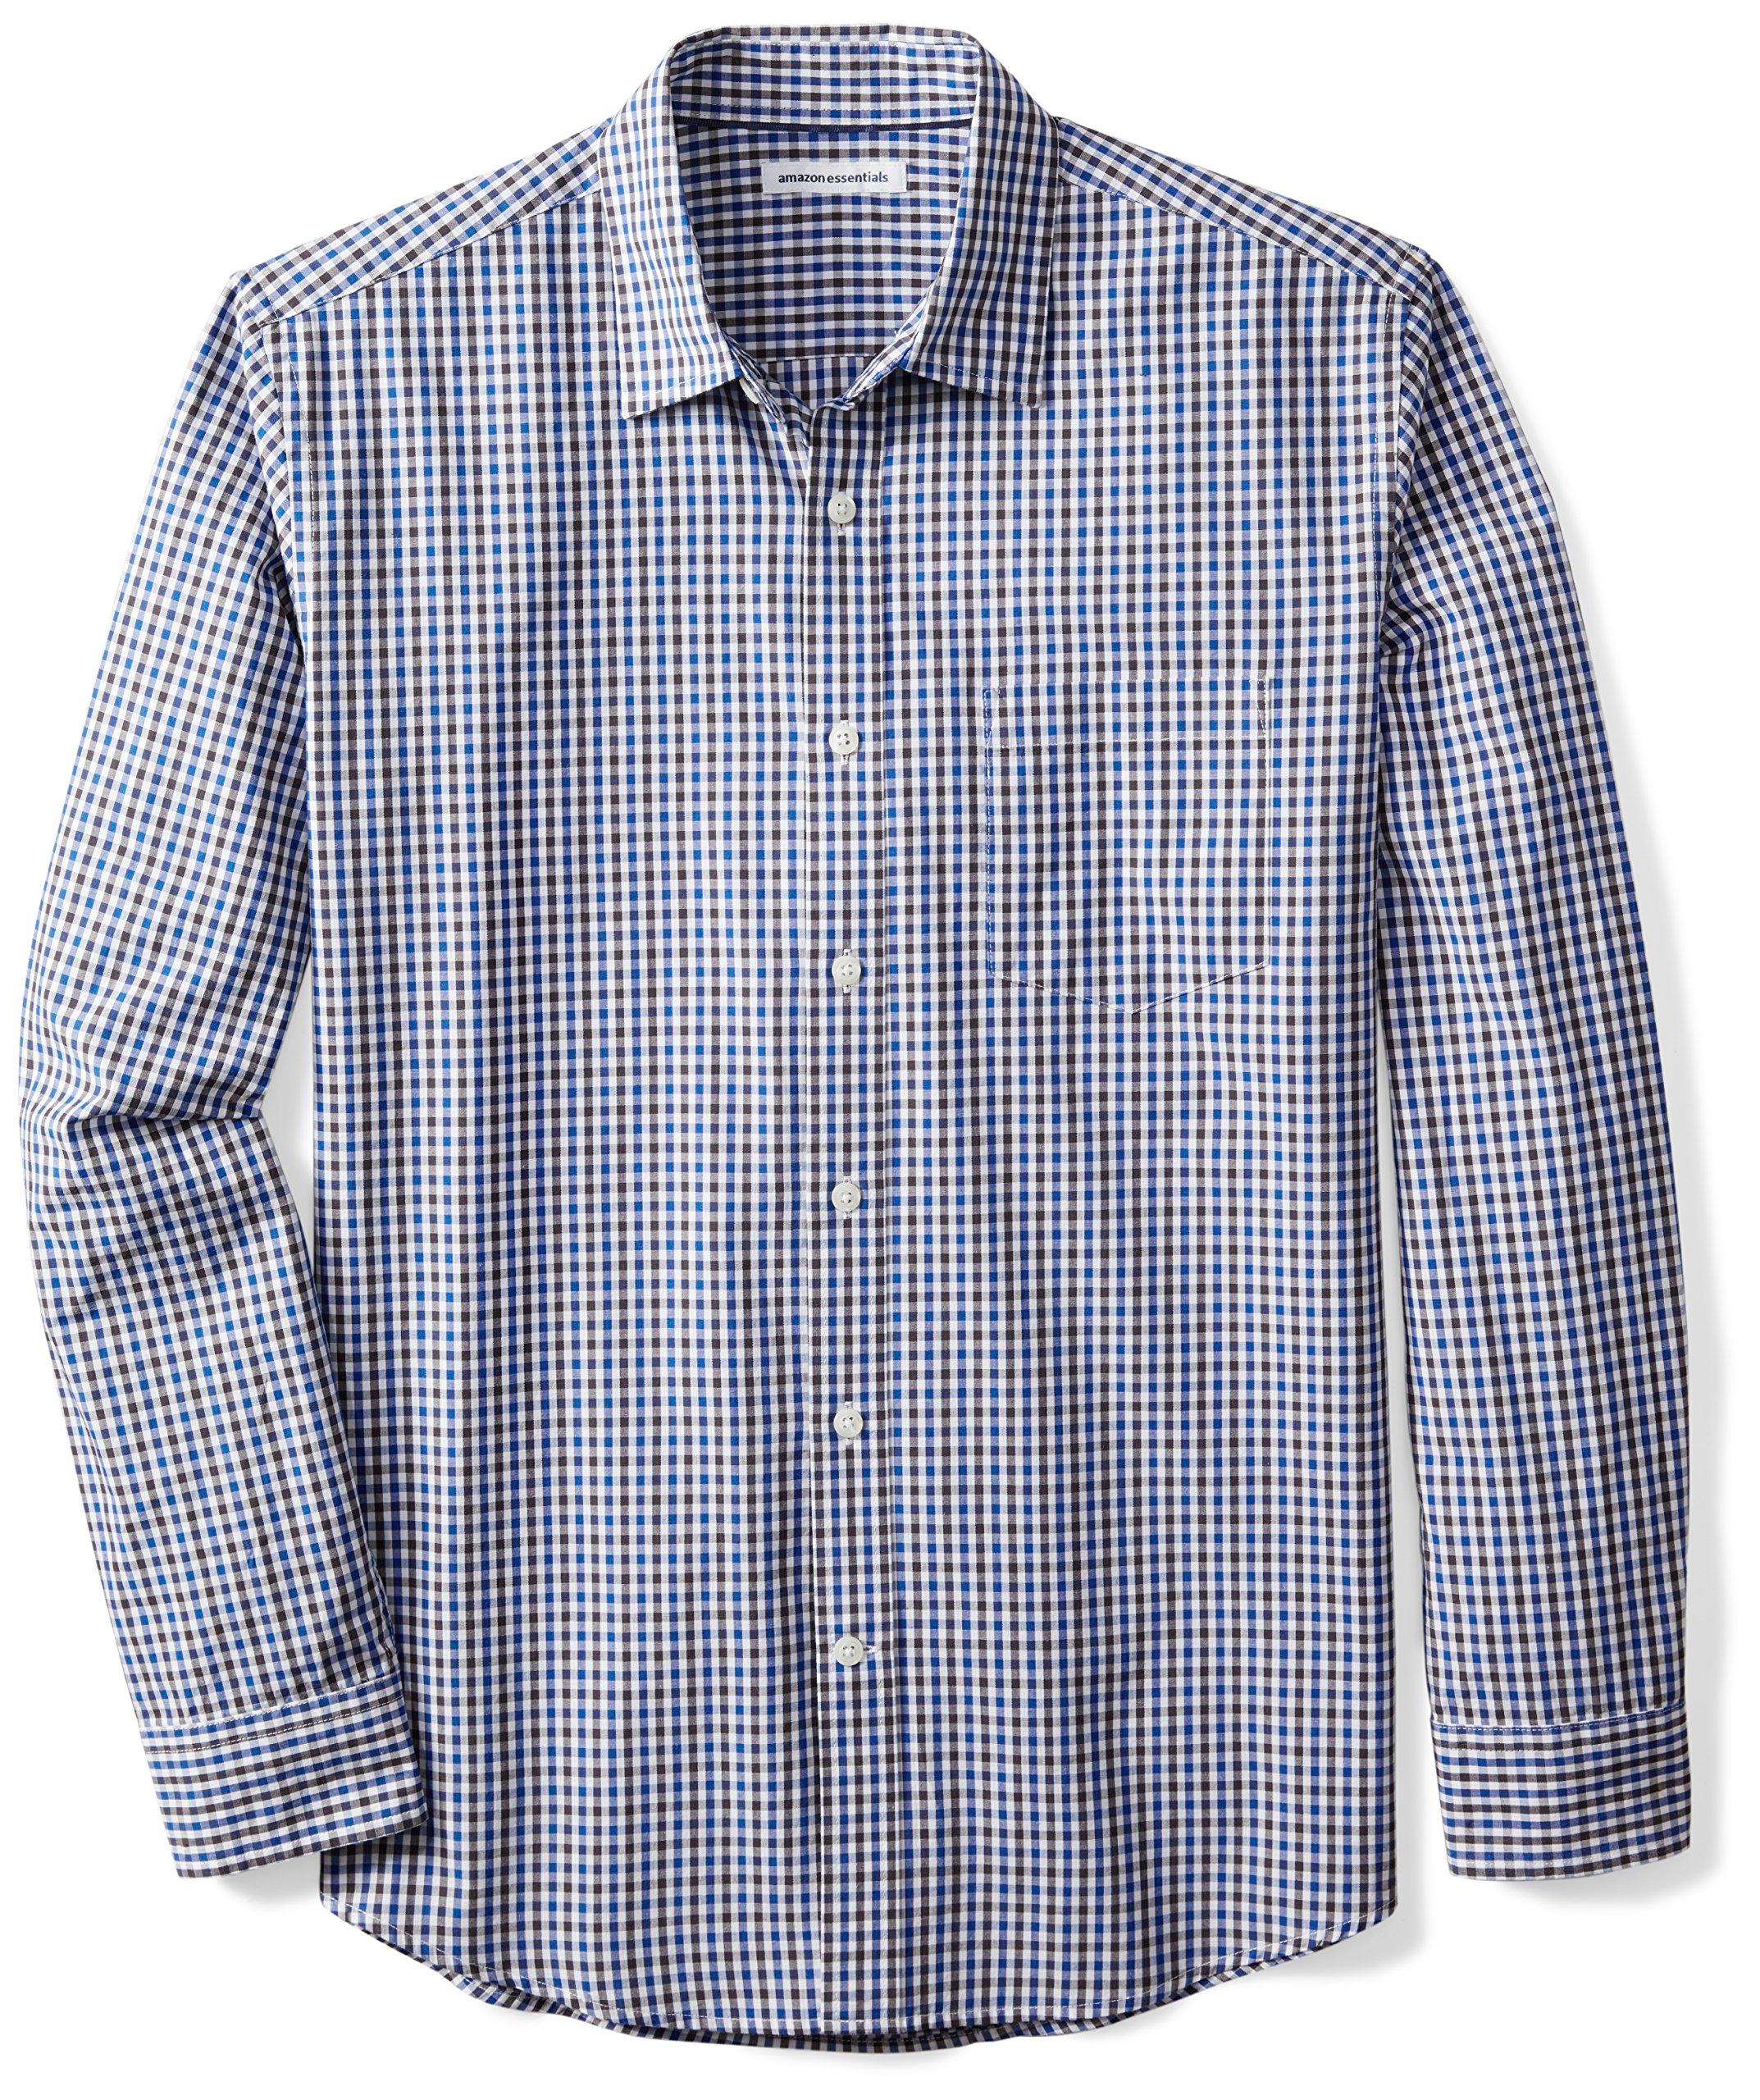 Amazon Essentials Men's Regular-Fit Long-Sleeve Casual Poplin Shirt, Blue/Black Gingham, Large by Amazon Essentials